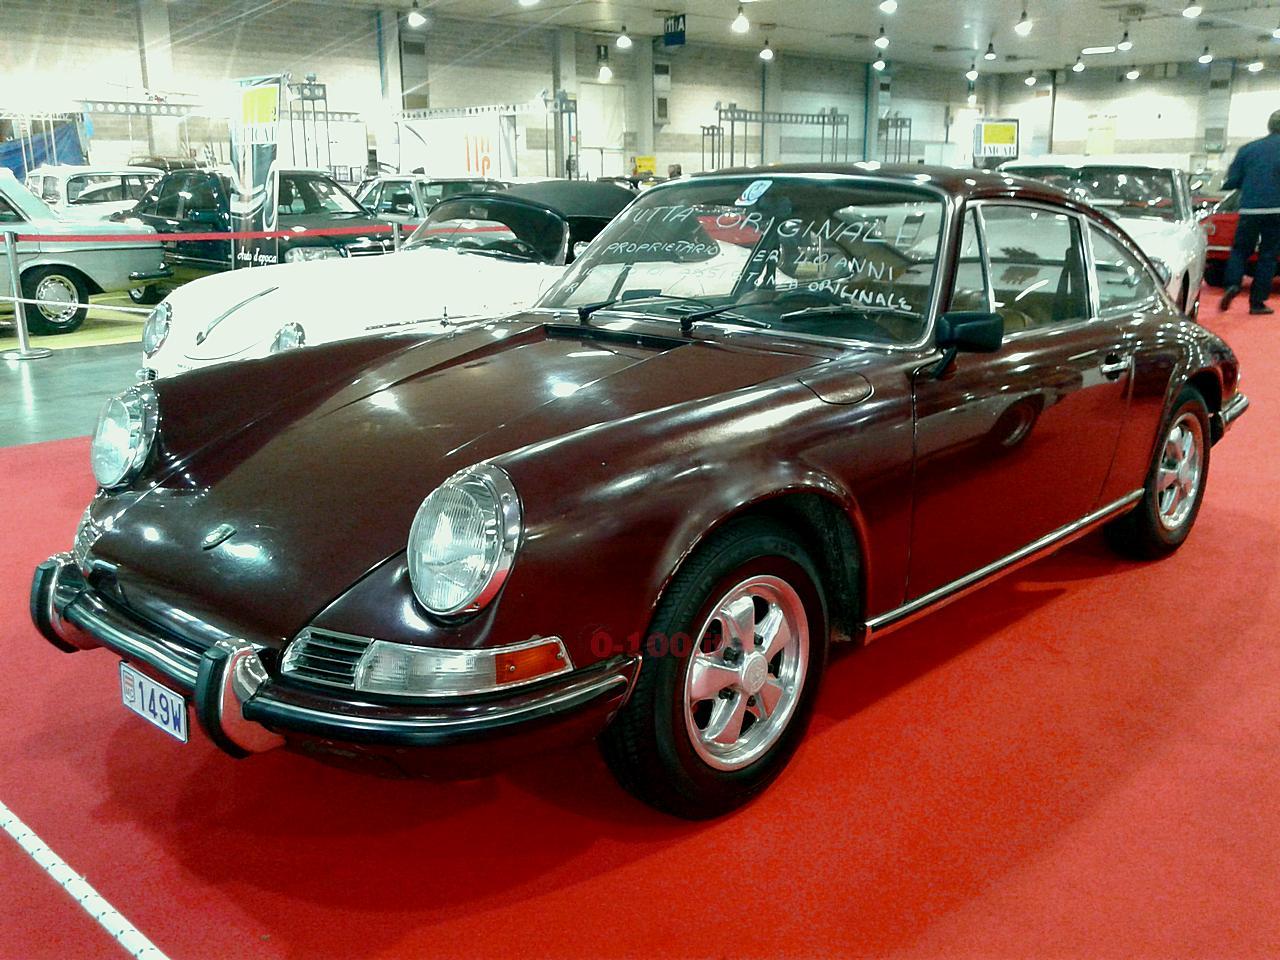 automotodepoca-2015-porsche-911-964-993-carrera-turbo_0-100_035